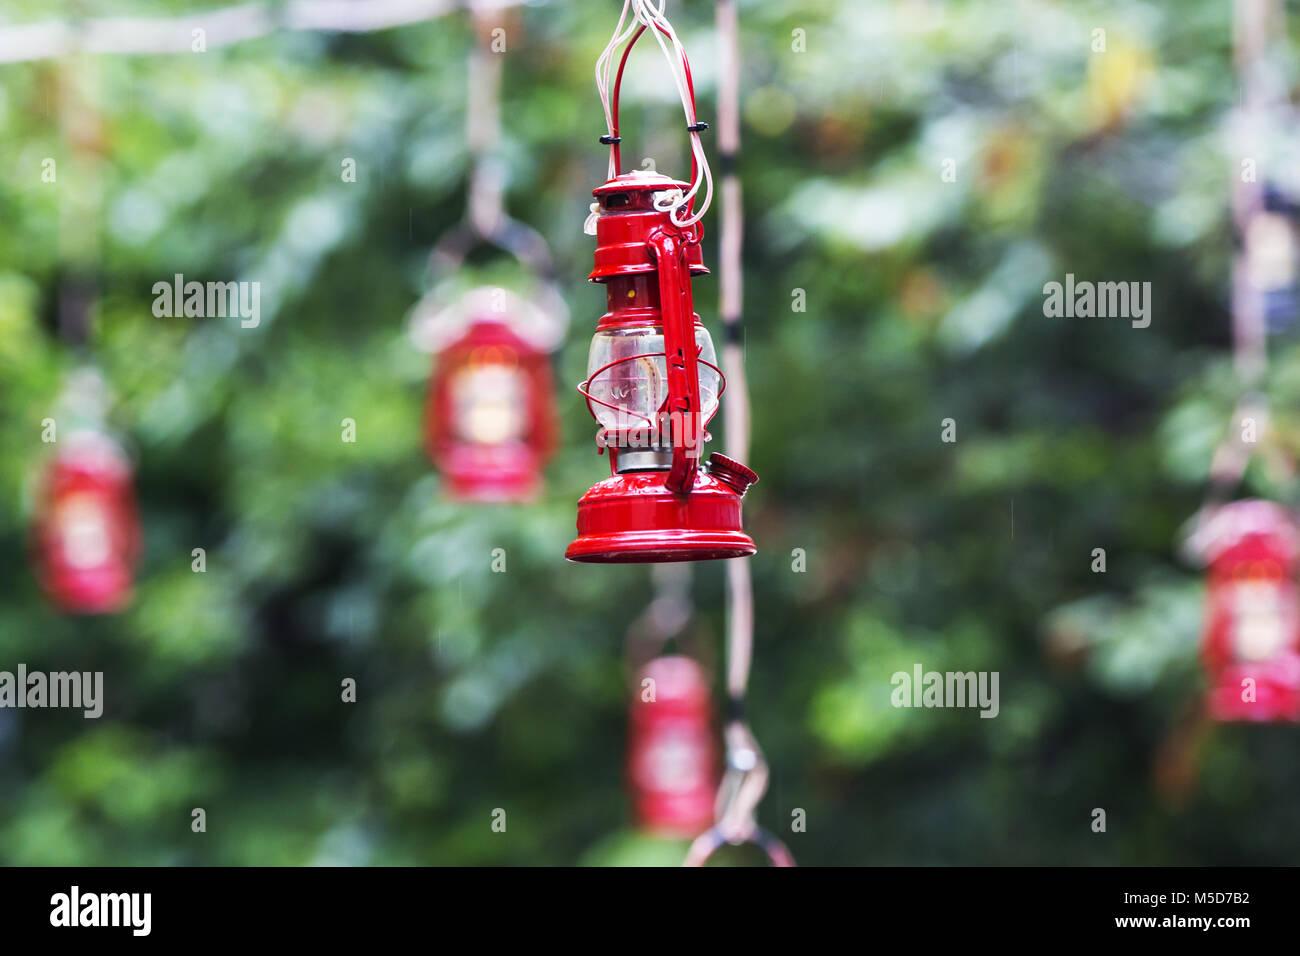 vintage kerosene oil lantern lamp hanging on the wire - Stock Image